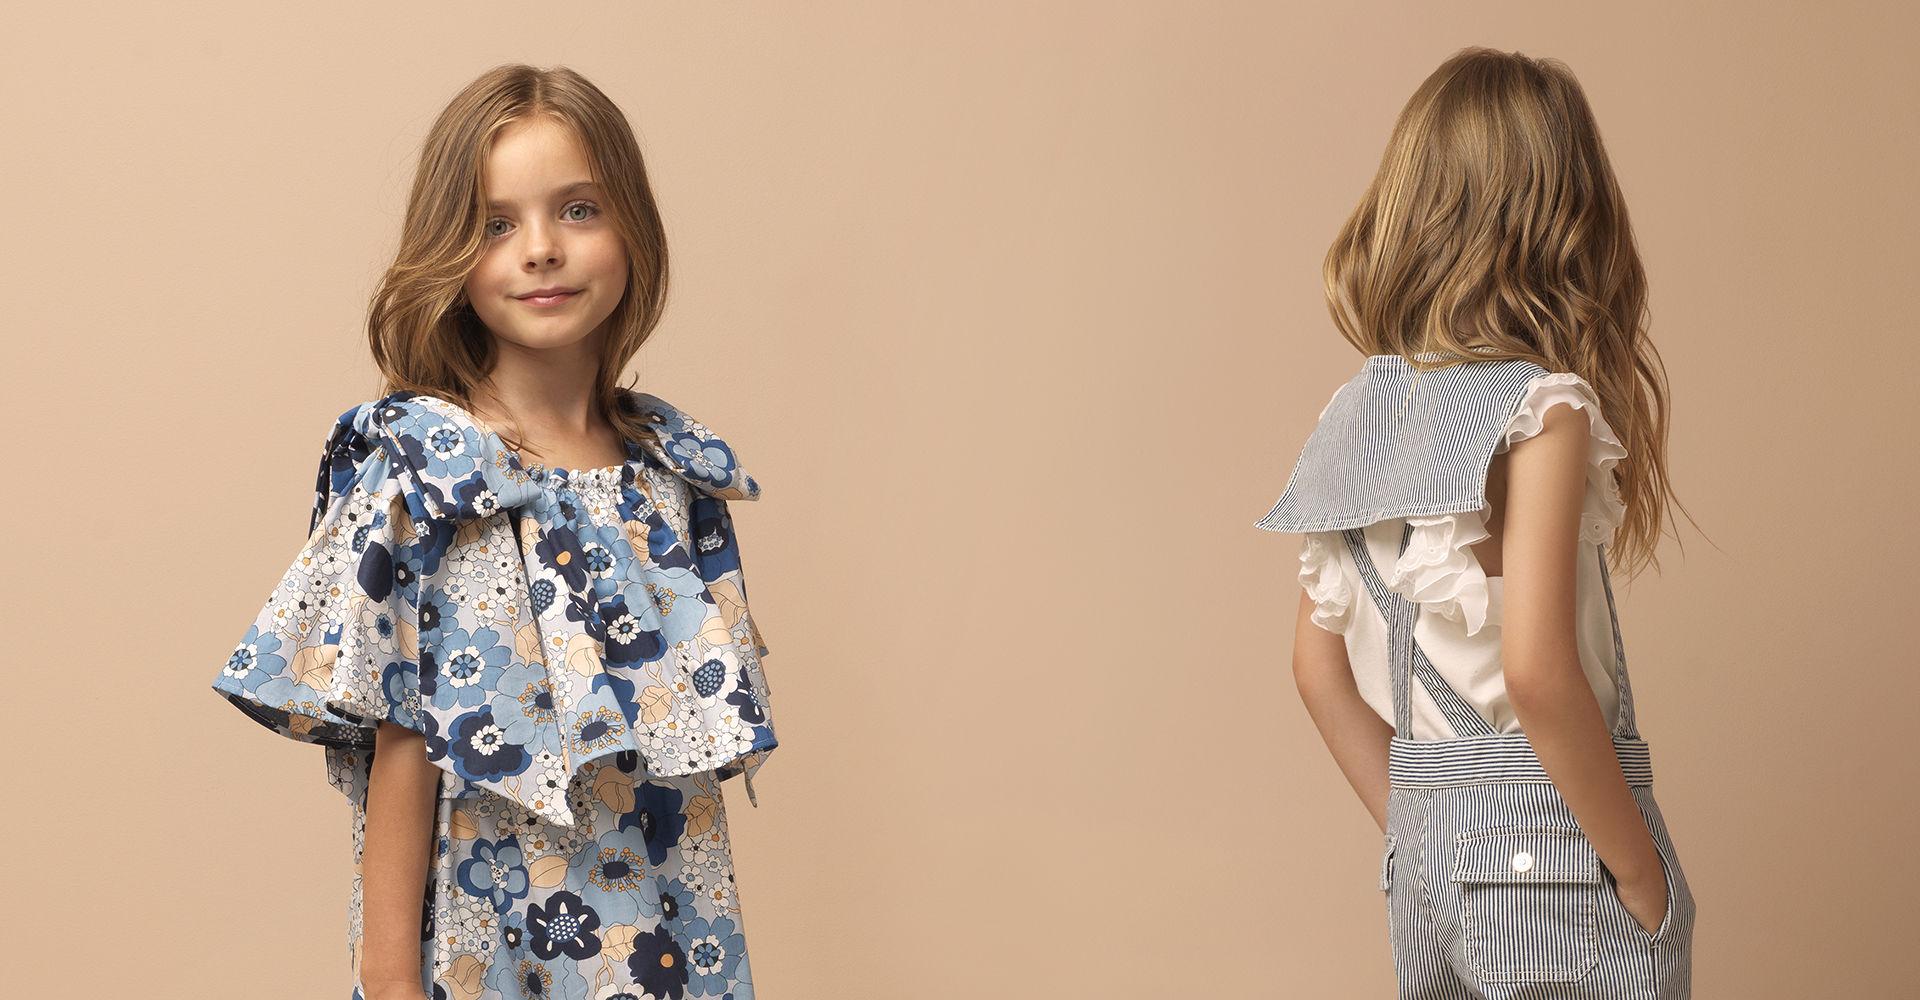 SR_Childrenswear_Breezy summer silhouettes for little #chloeGIRLS